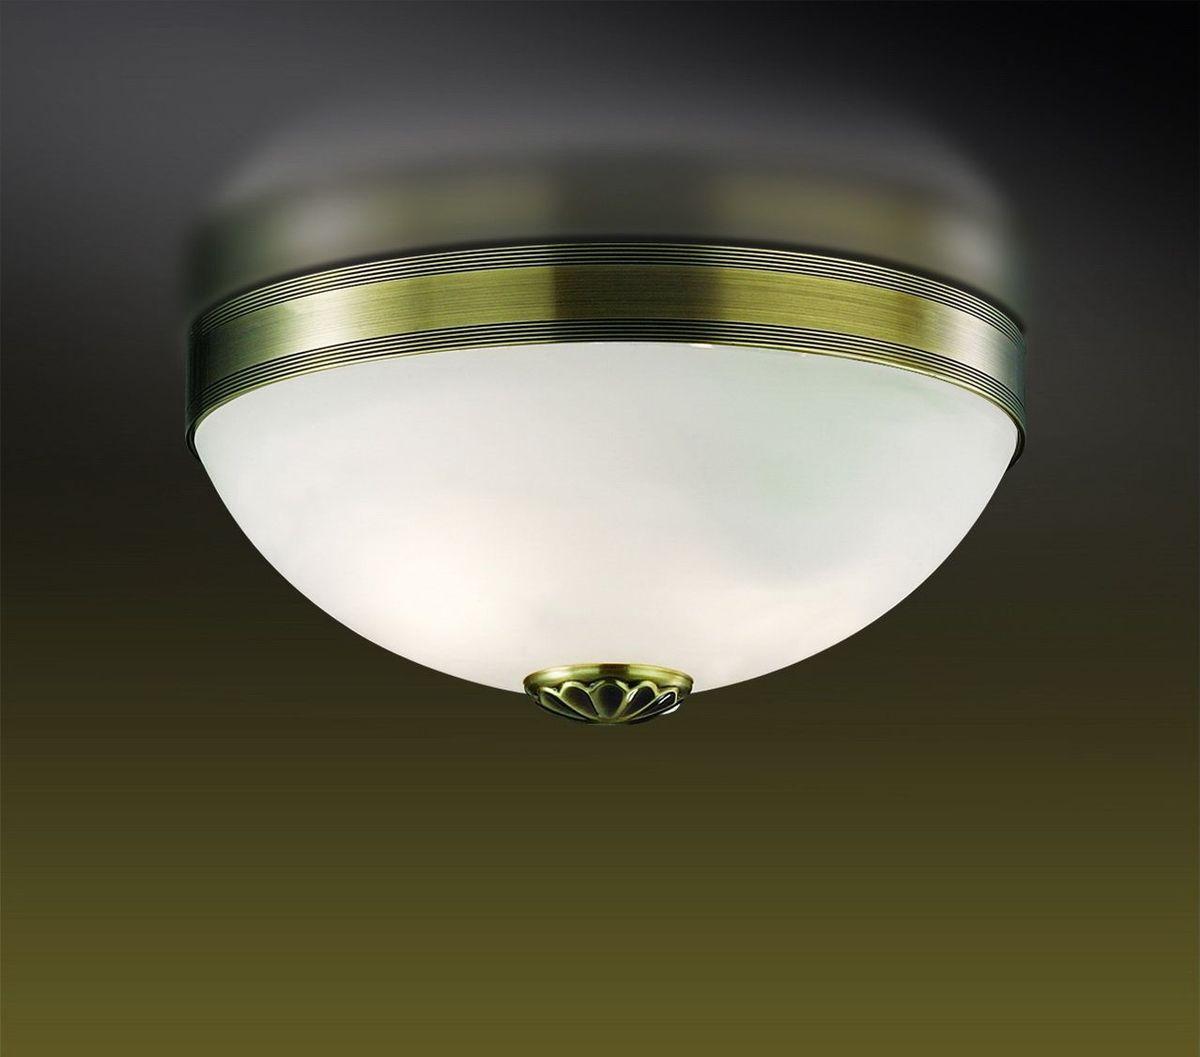 Светильник потолочный Odeon Light Ovale, 2 х E27, 60W. 1990/2C1990/2C